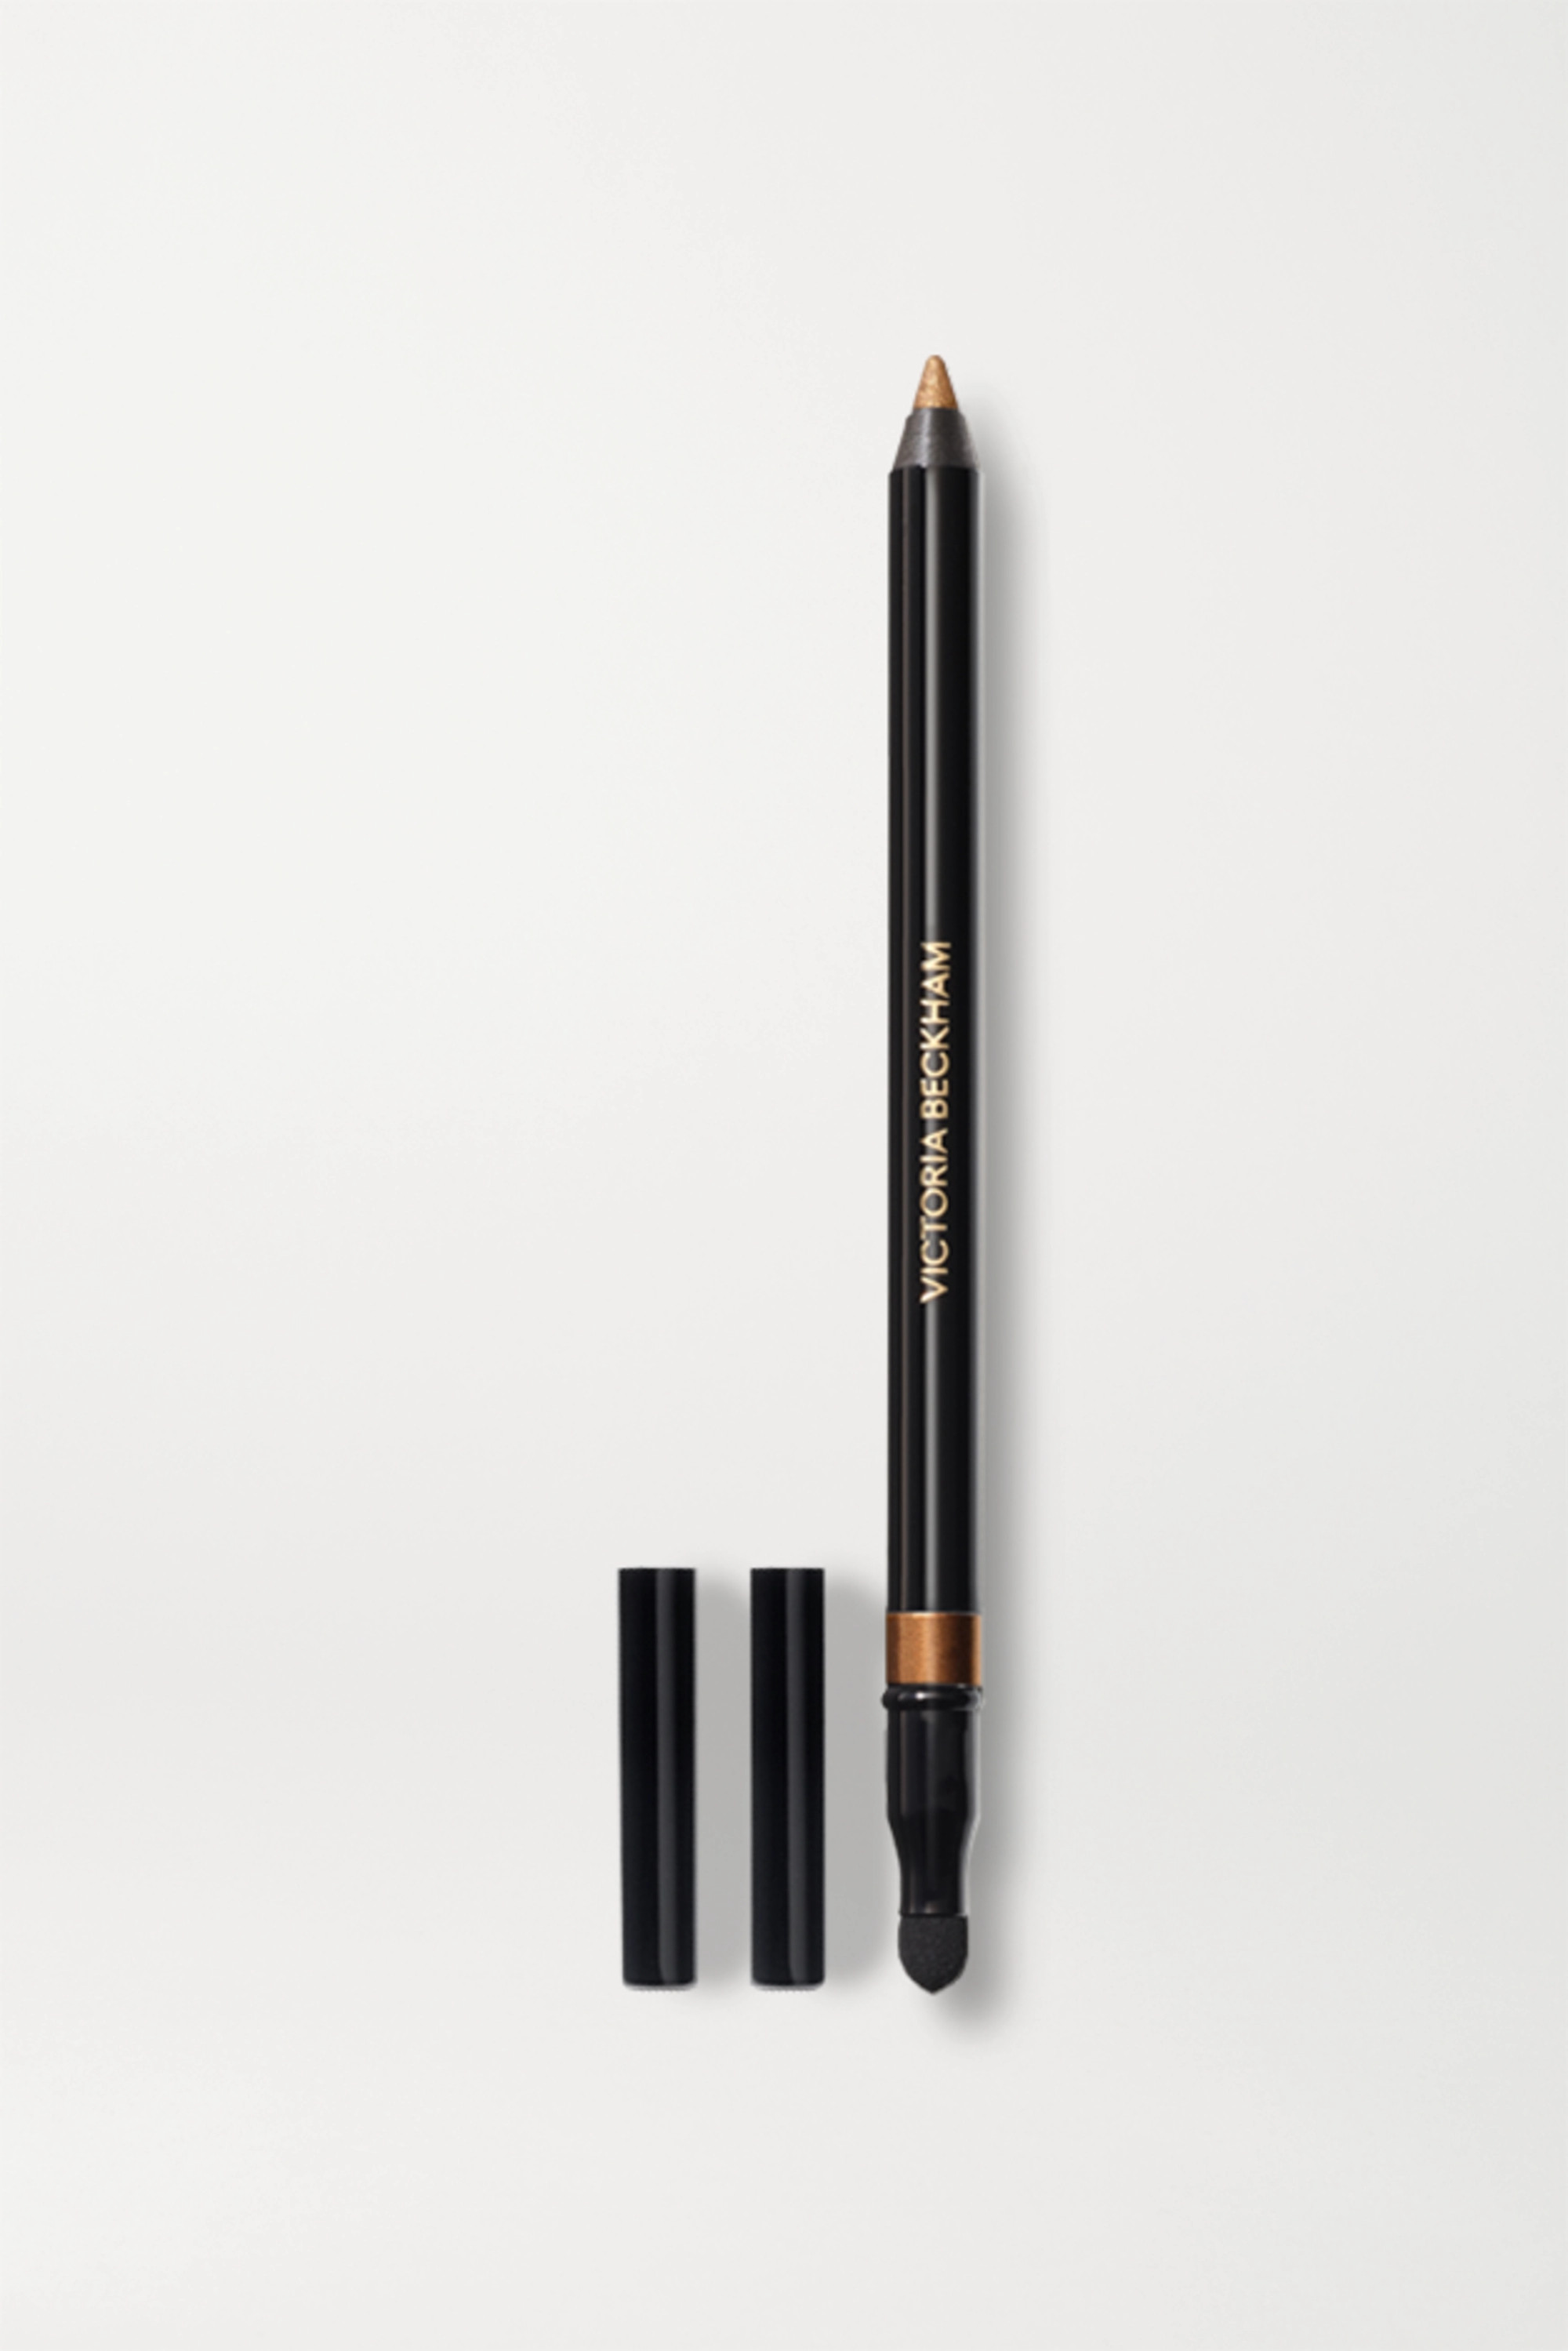 Victoria Beckham Beauty Satin Kajal Liner - Bronze